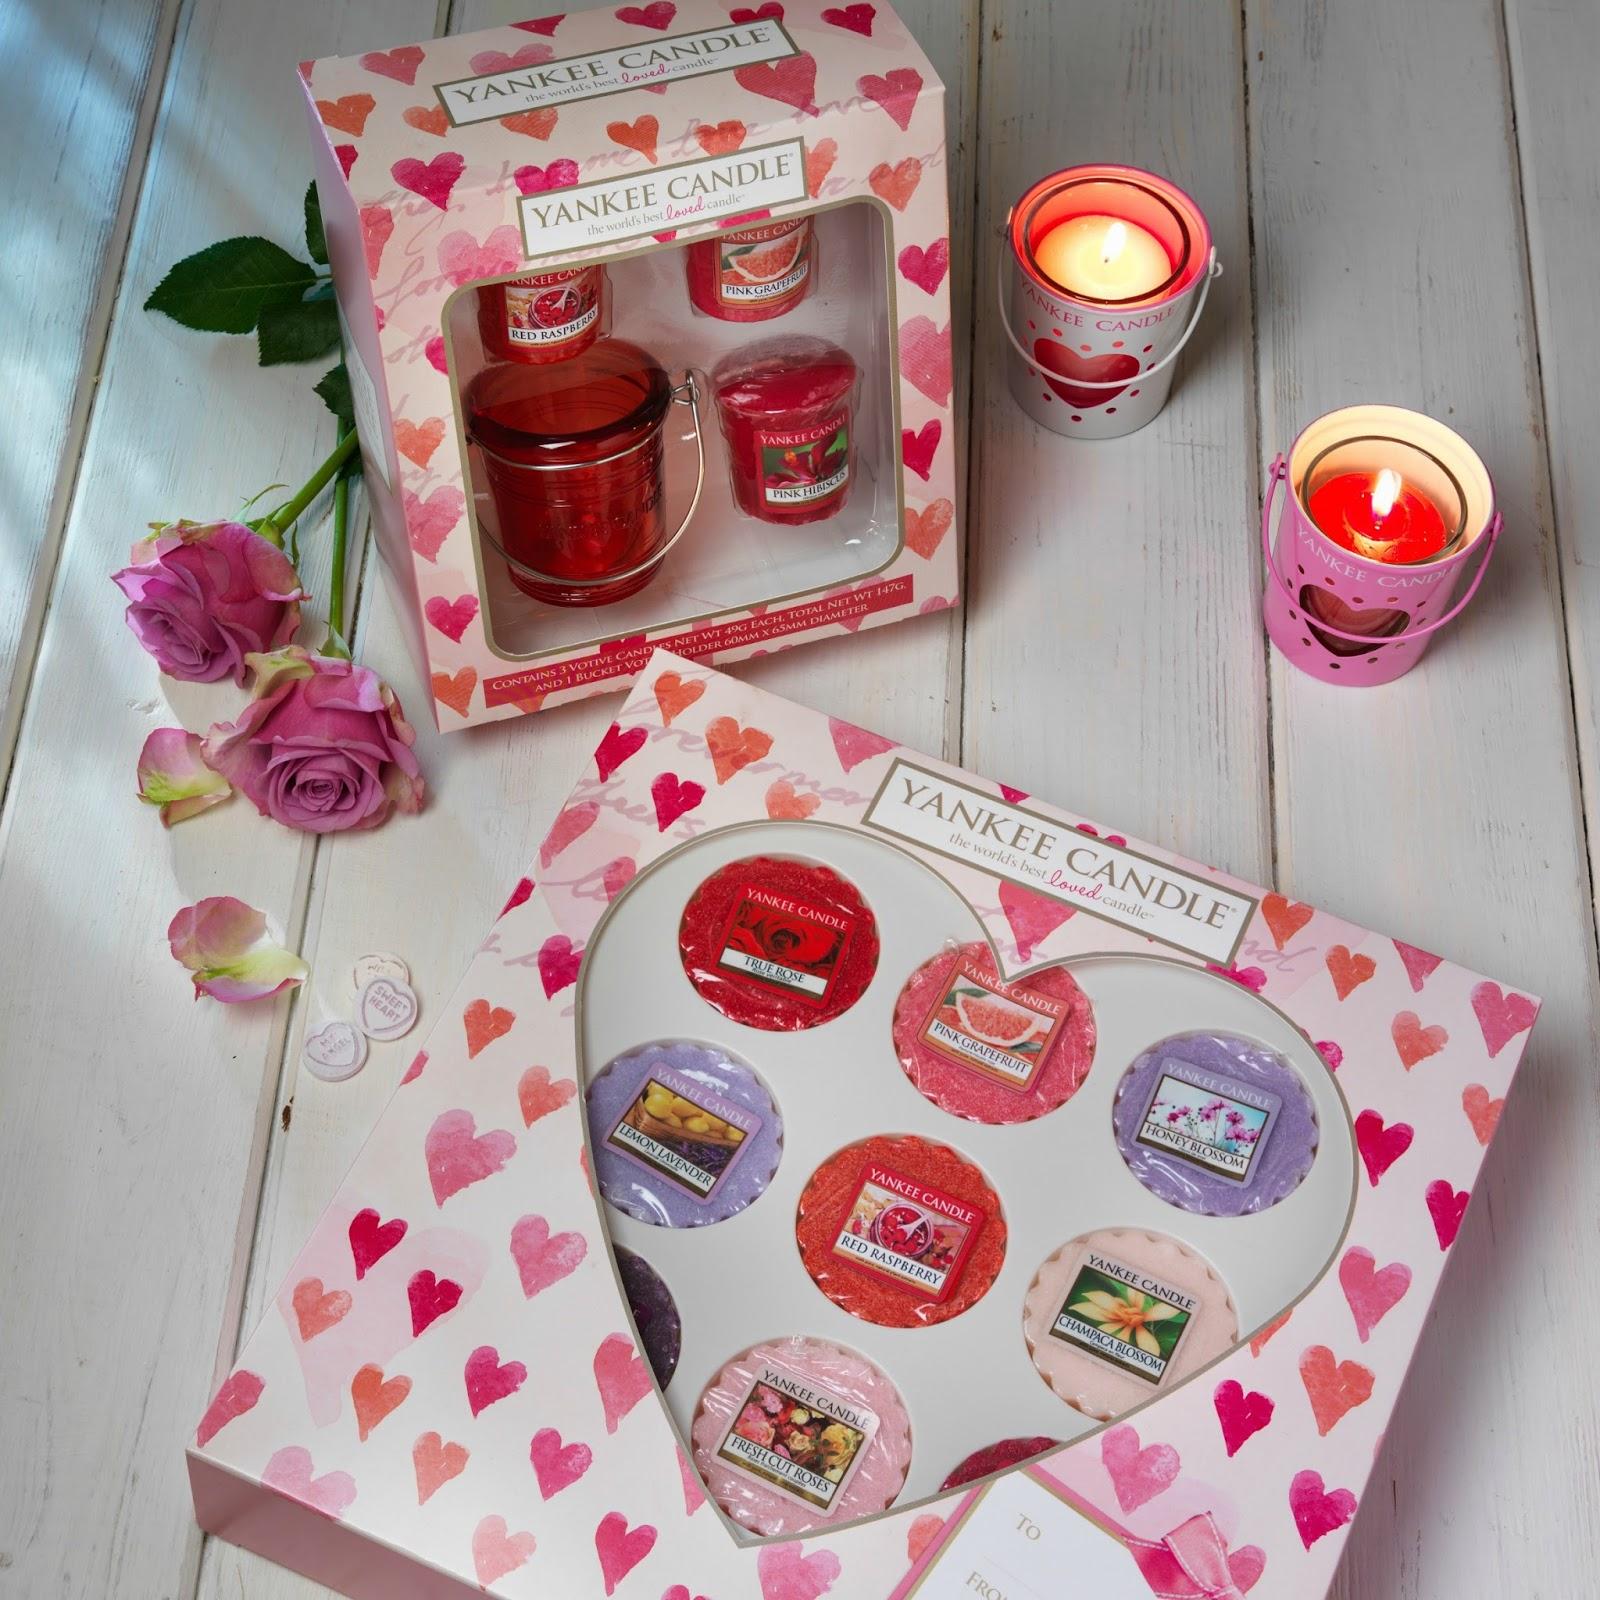 Canada Goose toronto outlet shop - Confessions of a Secret Shopper: Valentines Weekend | Valentines ...